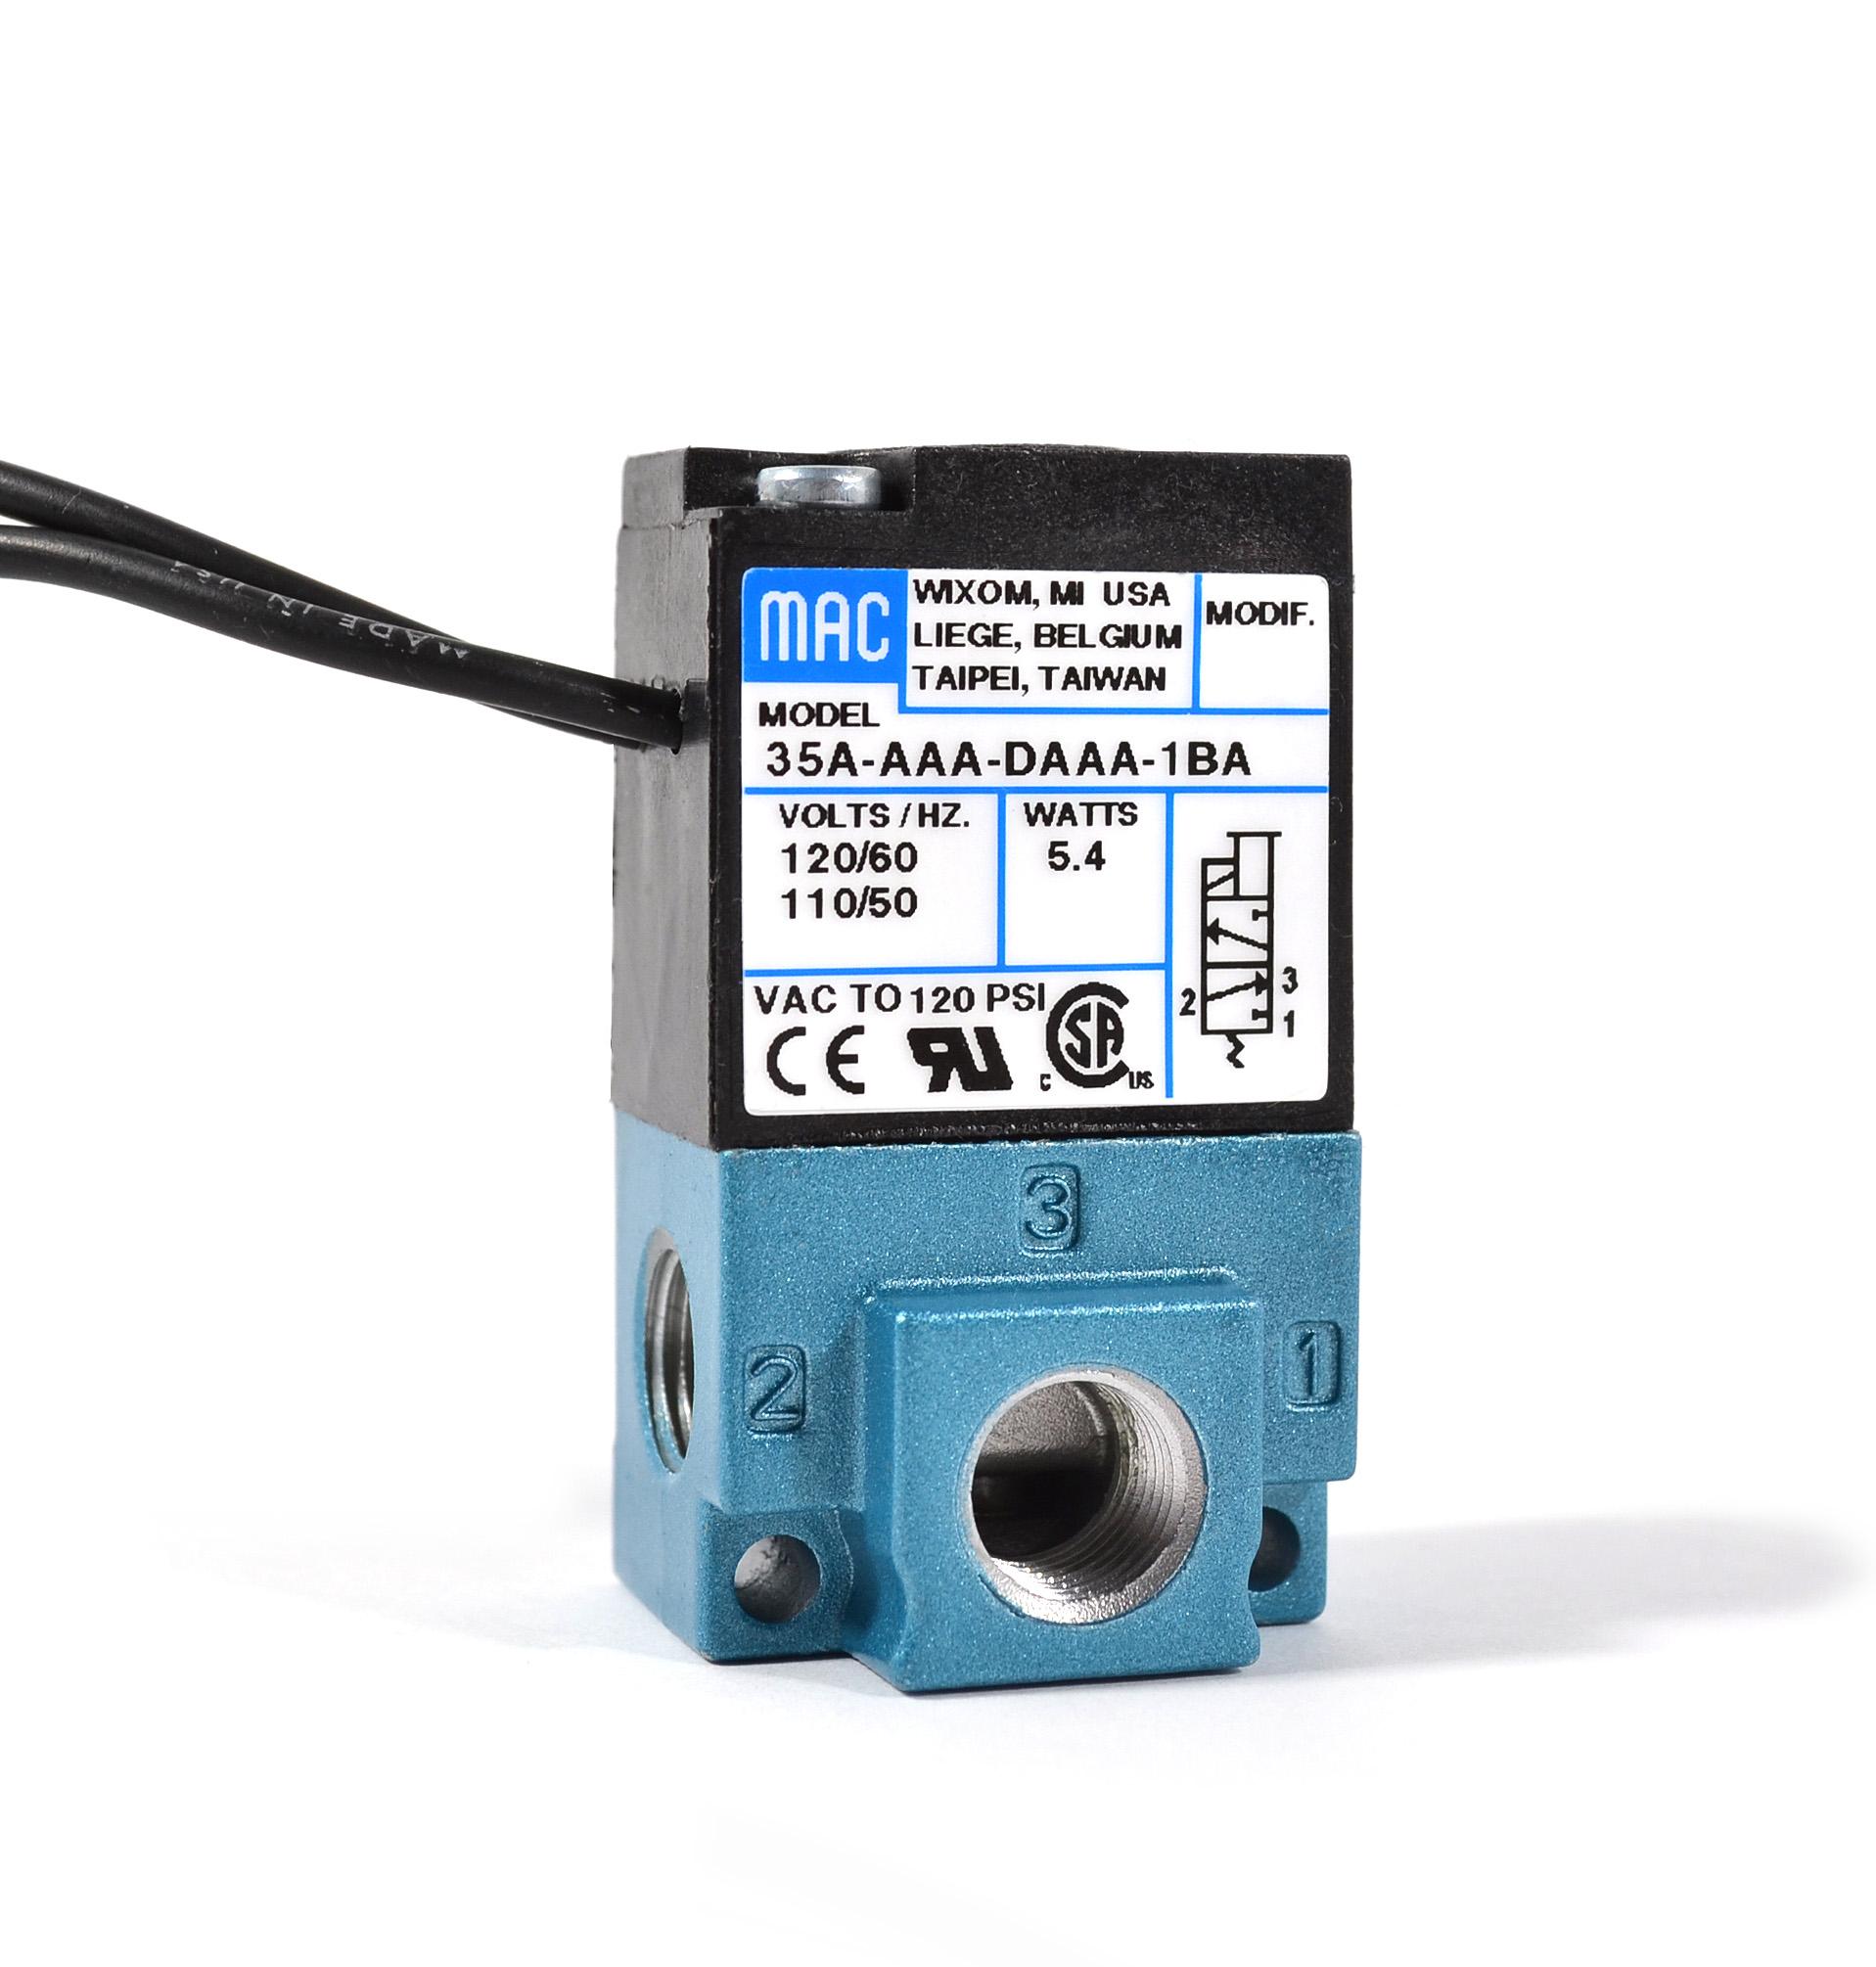 hight resolution of 3 way air valves mac valves mac solenoid valve wiring home u003eproducts u003e3 way